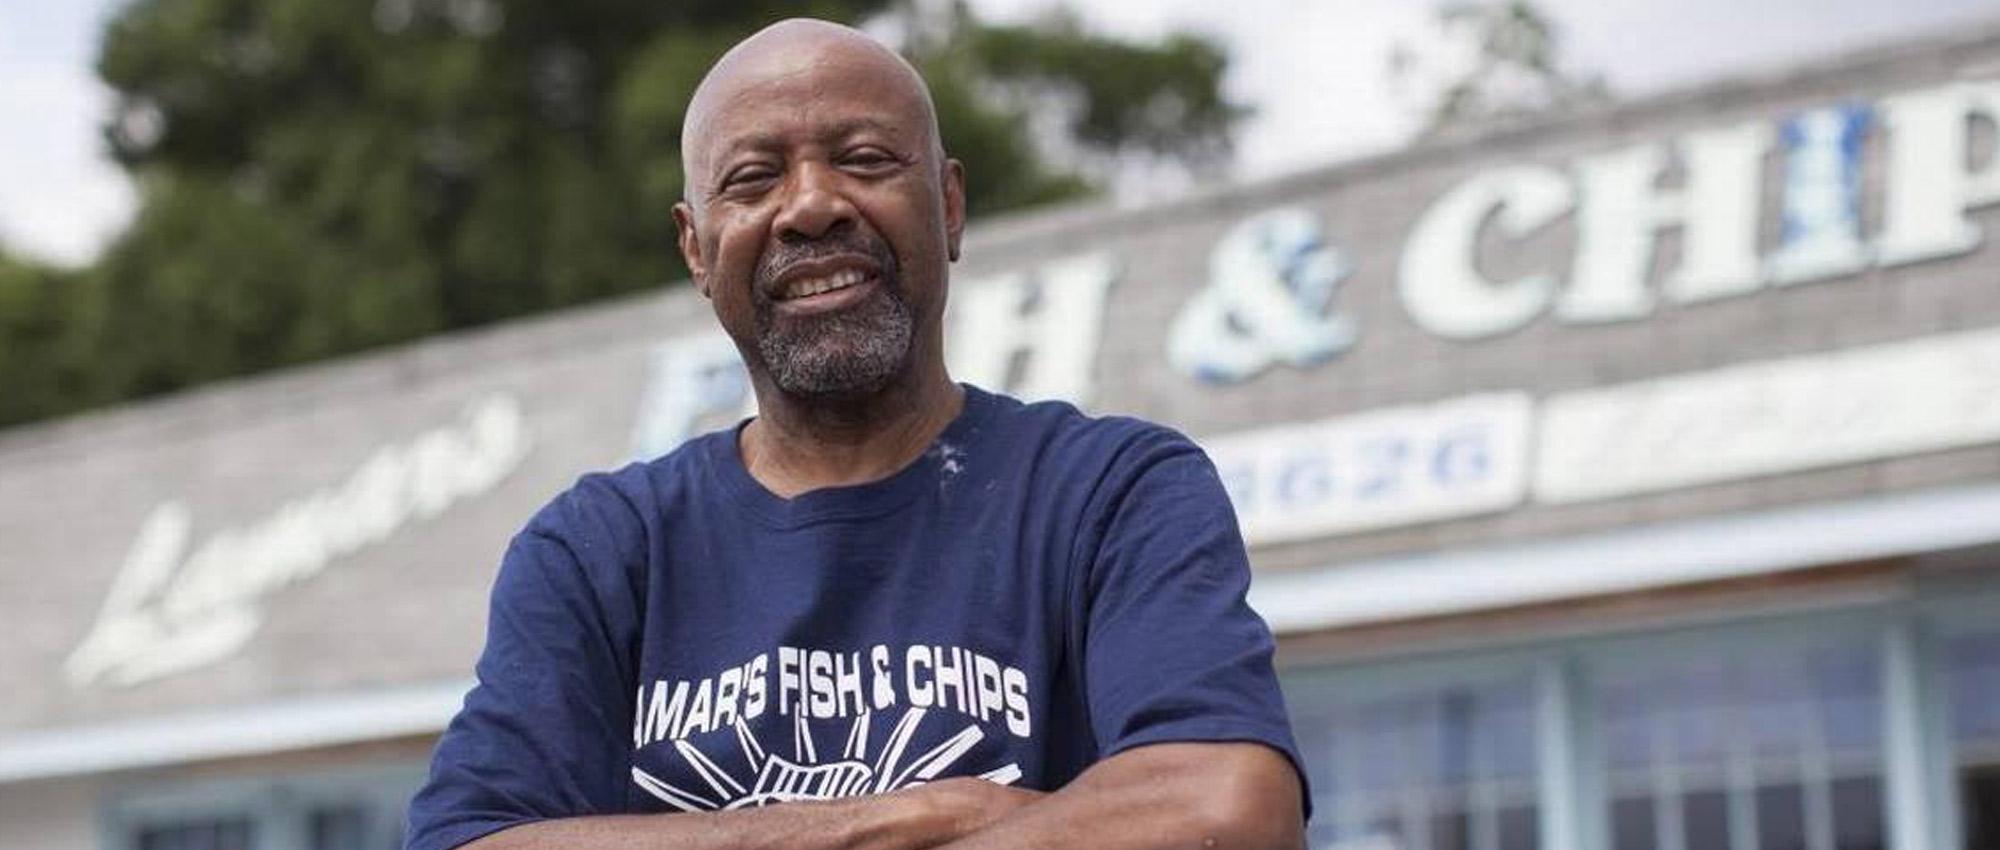 Lamar's Fish & Chips